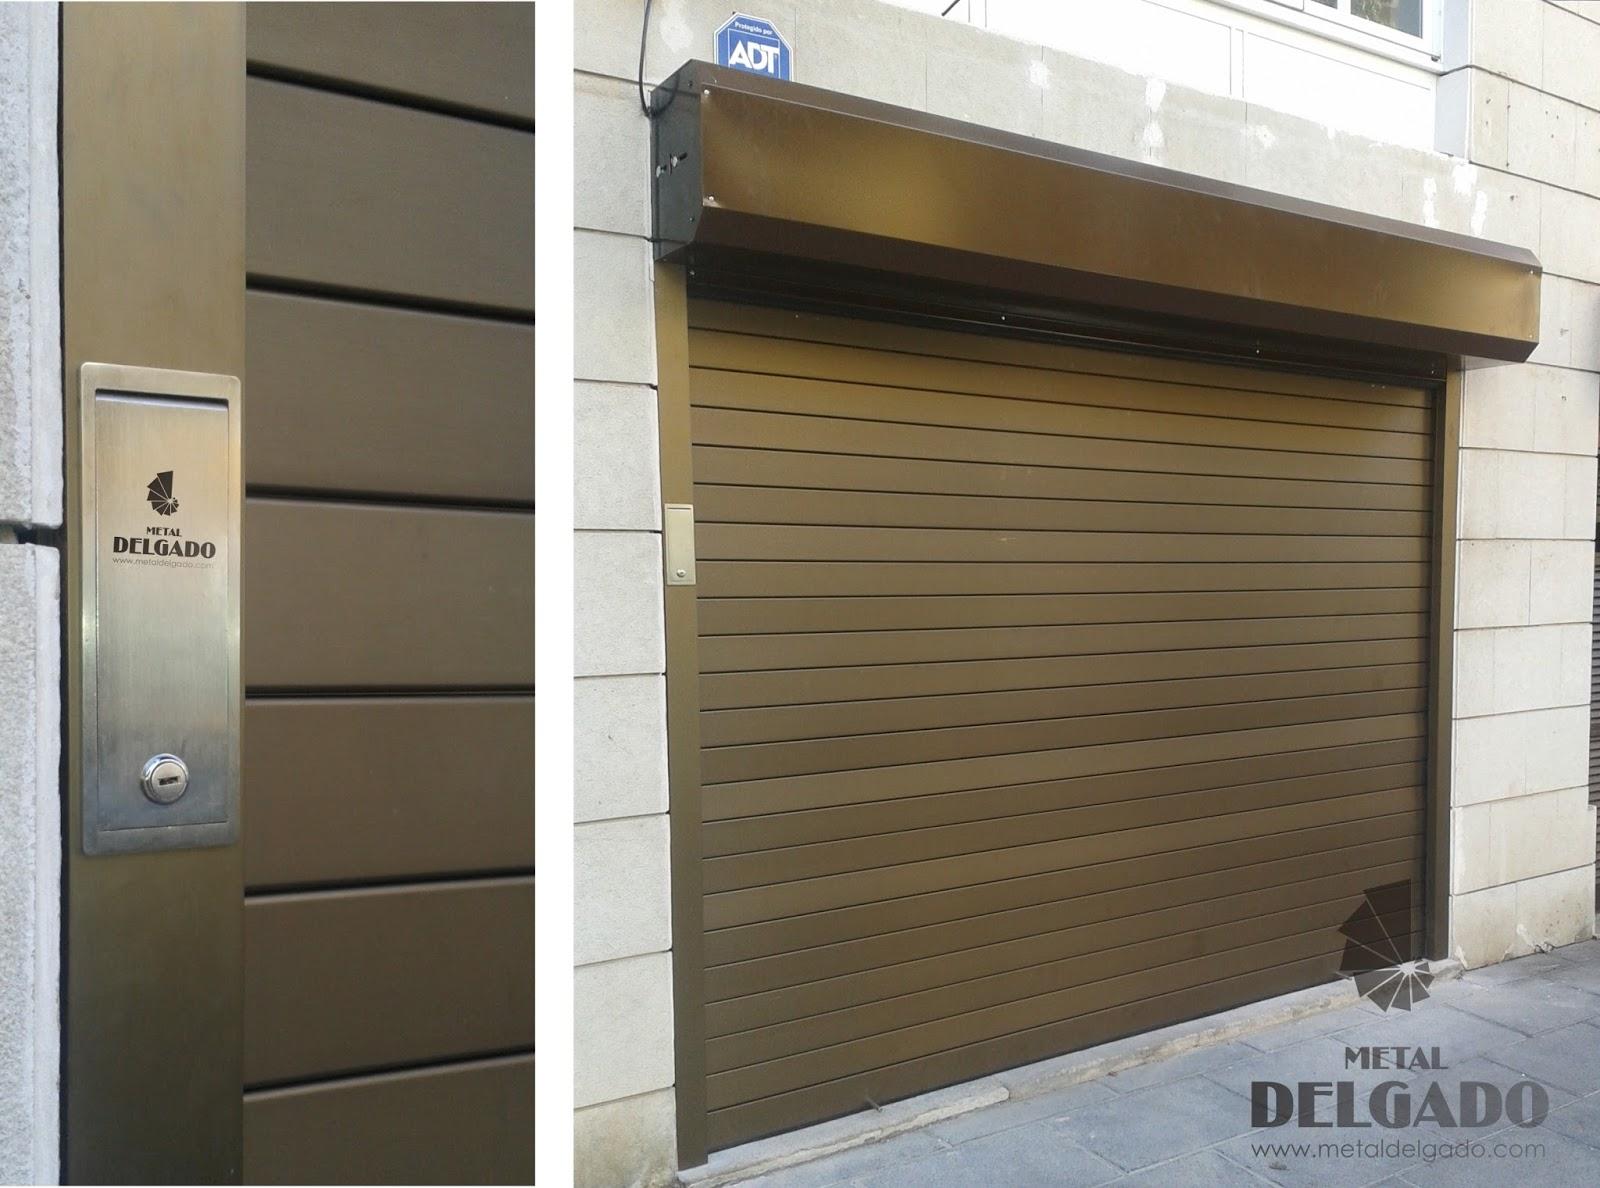 Puertas garaje tenerife puertas enrollables locales for Precio de puertas enrollables